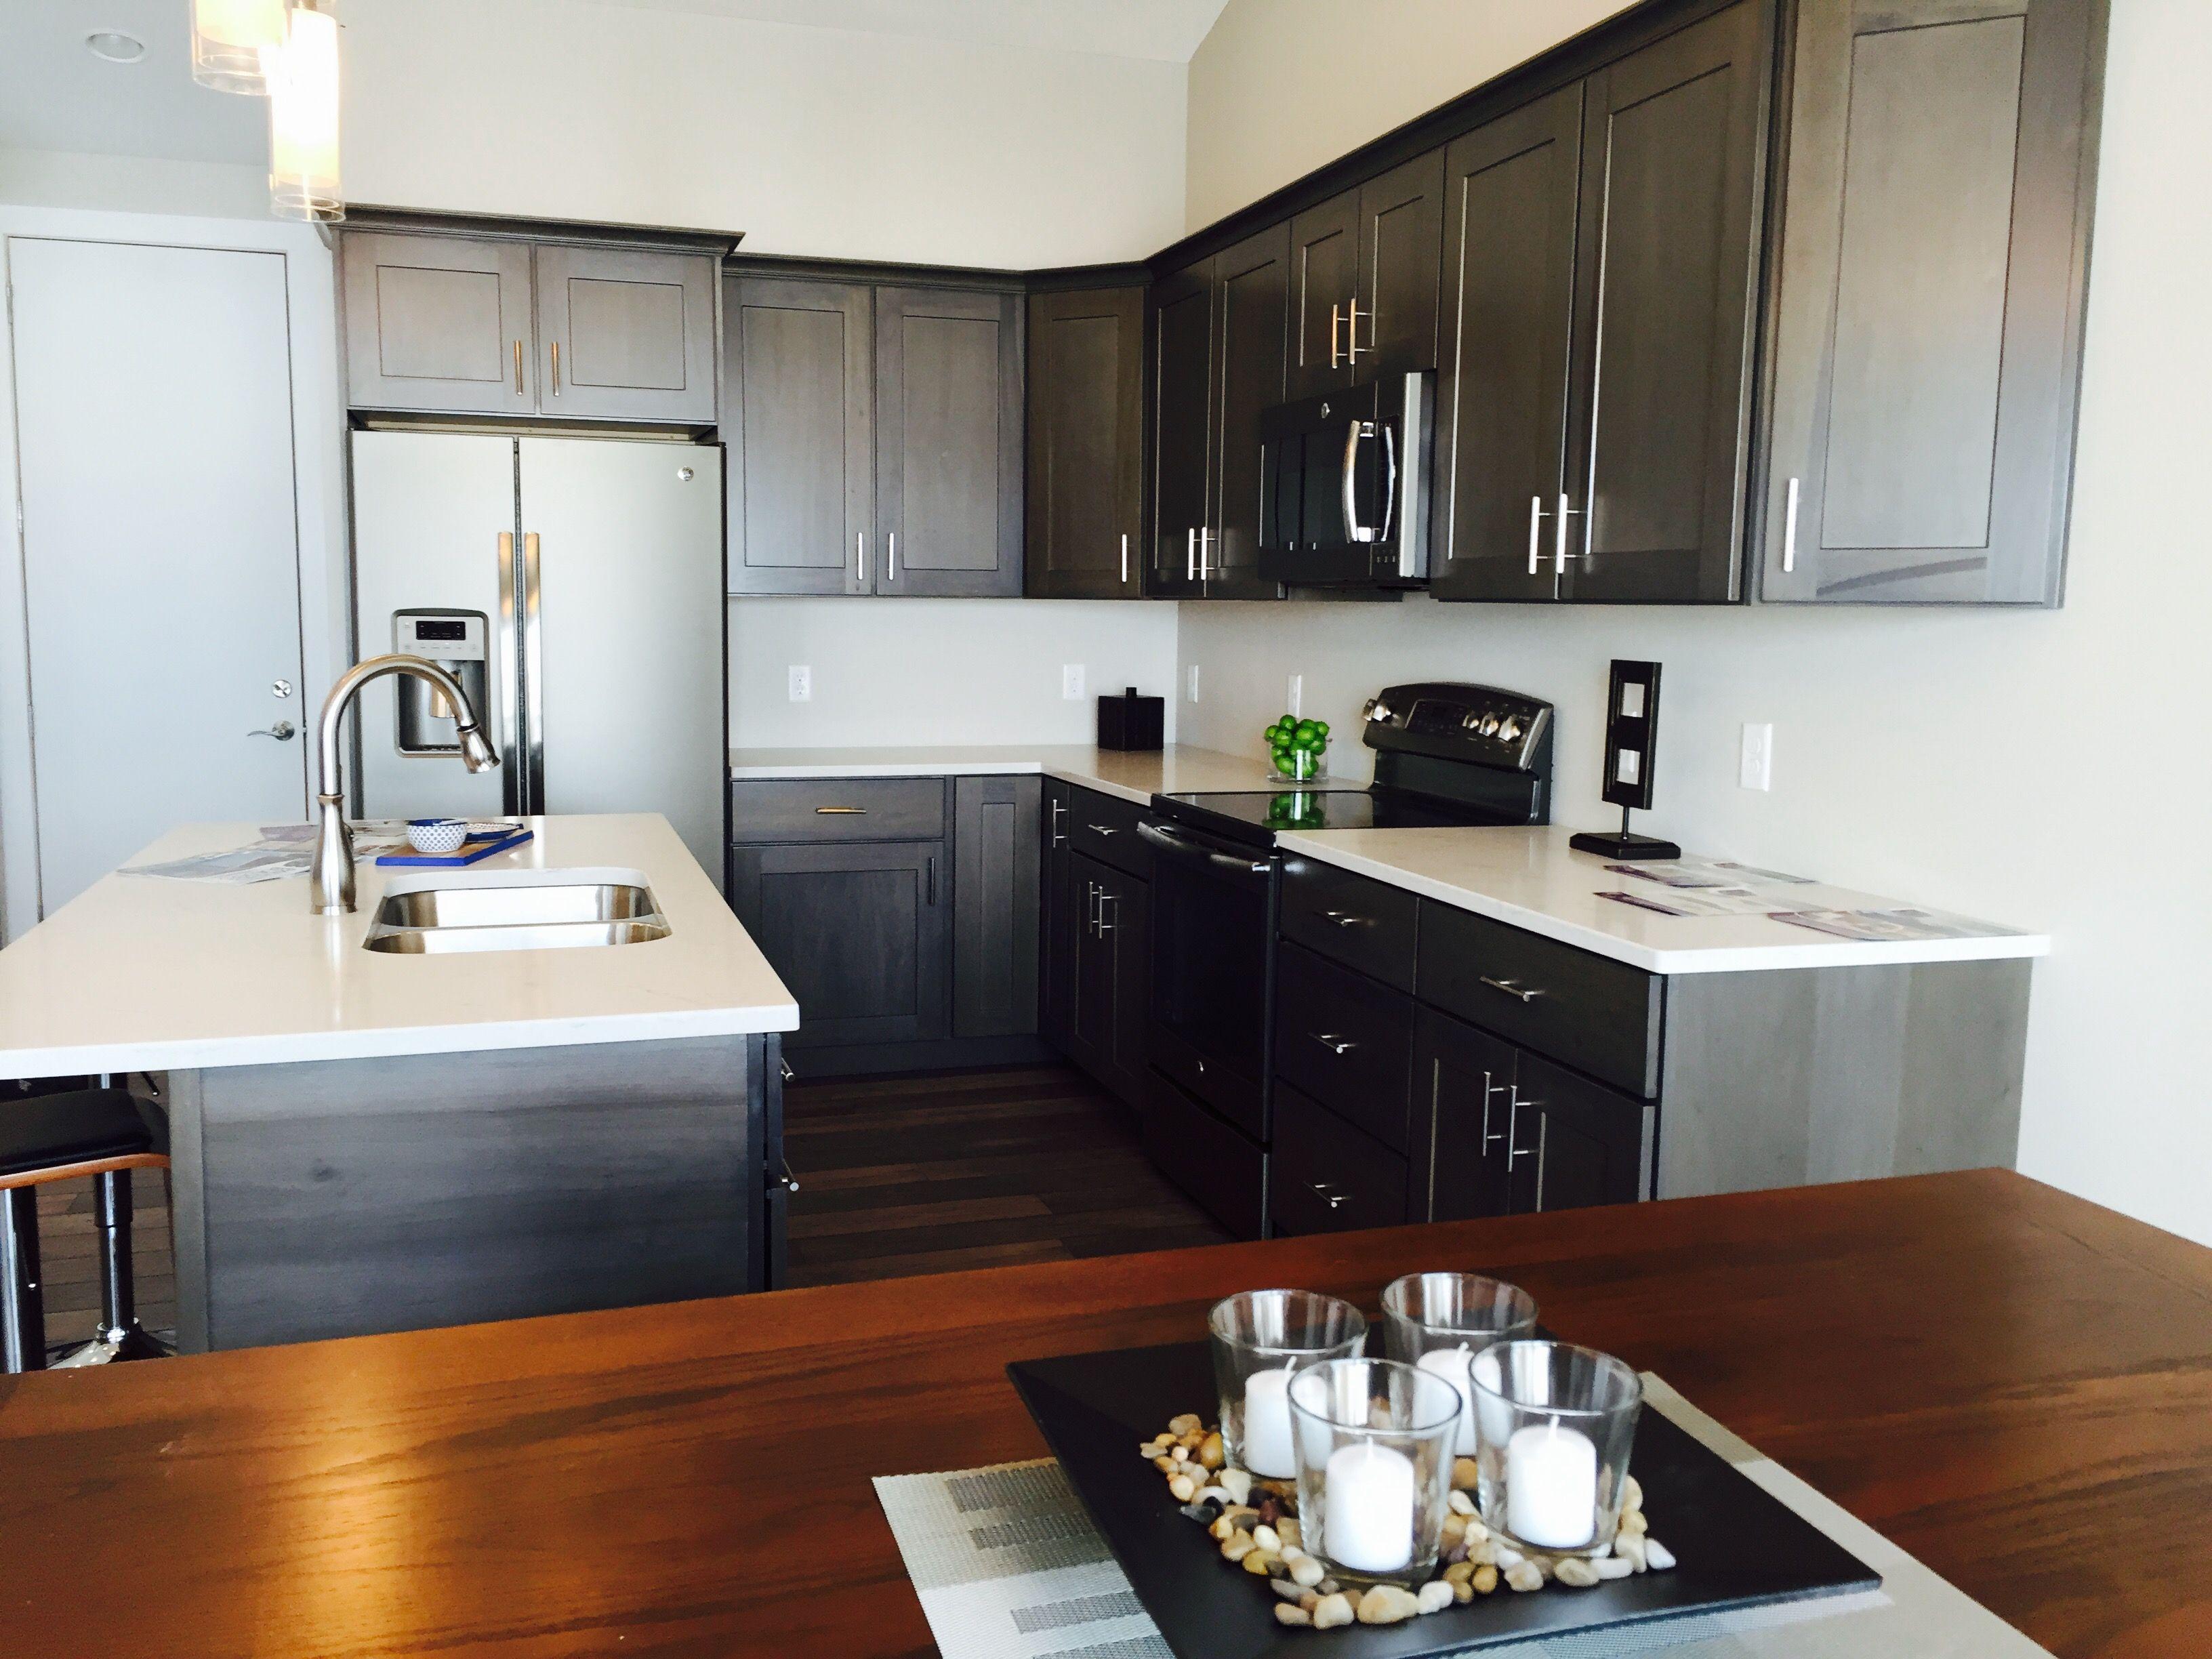 #Truman Kitchen. #Standard #Pendant Lights With #Aspect Lancaster Cabinets,  Color